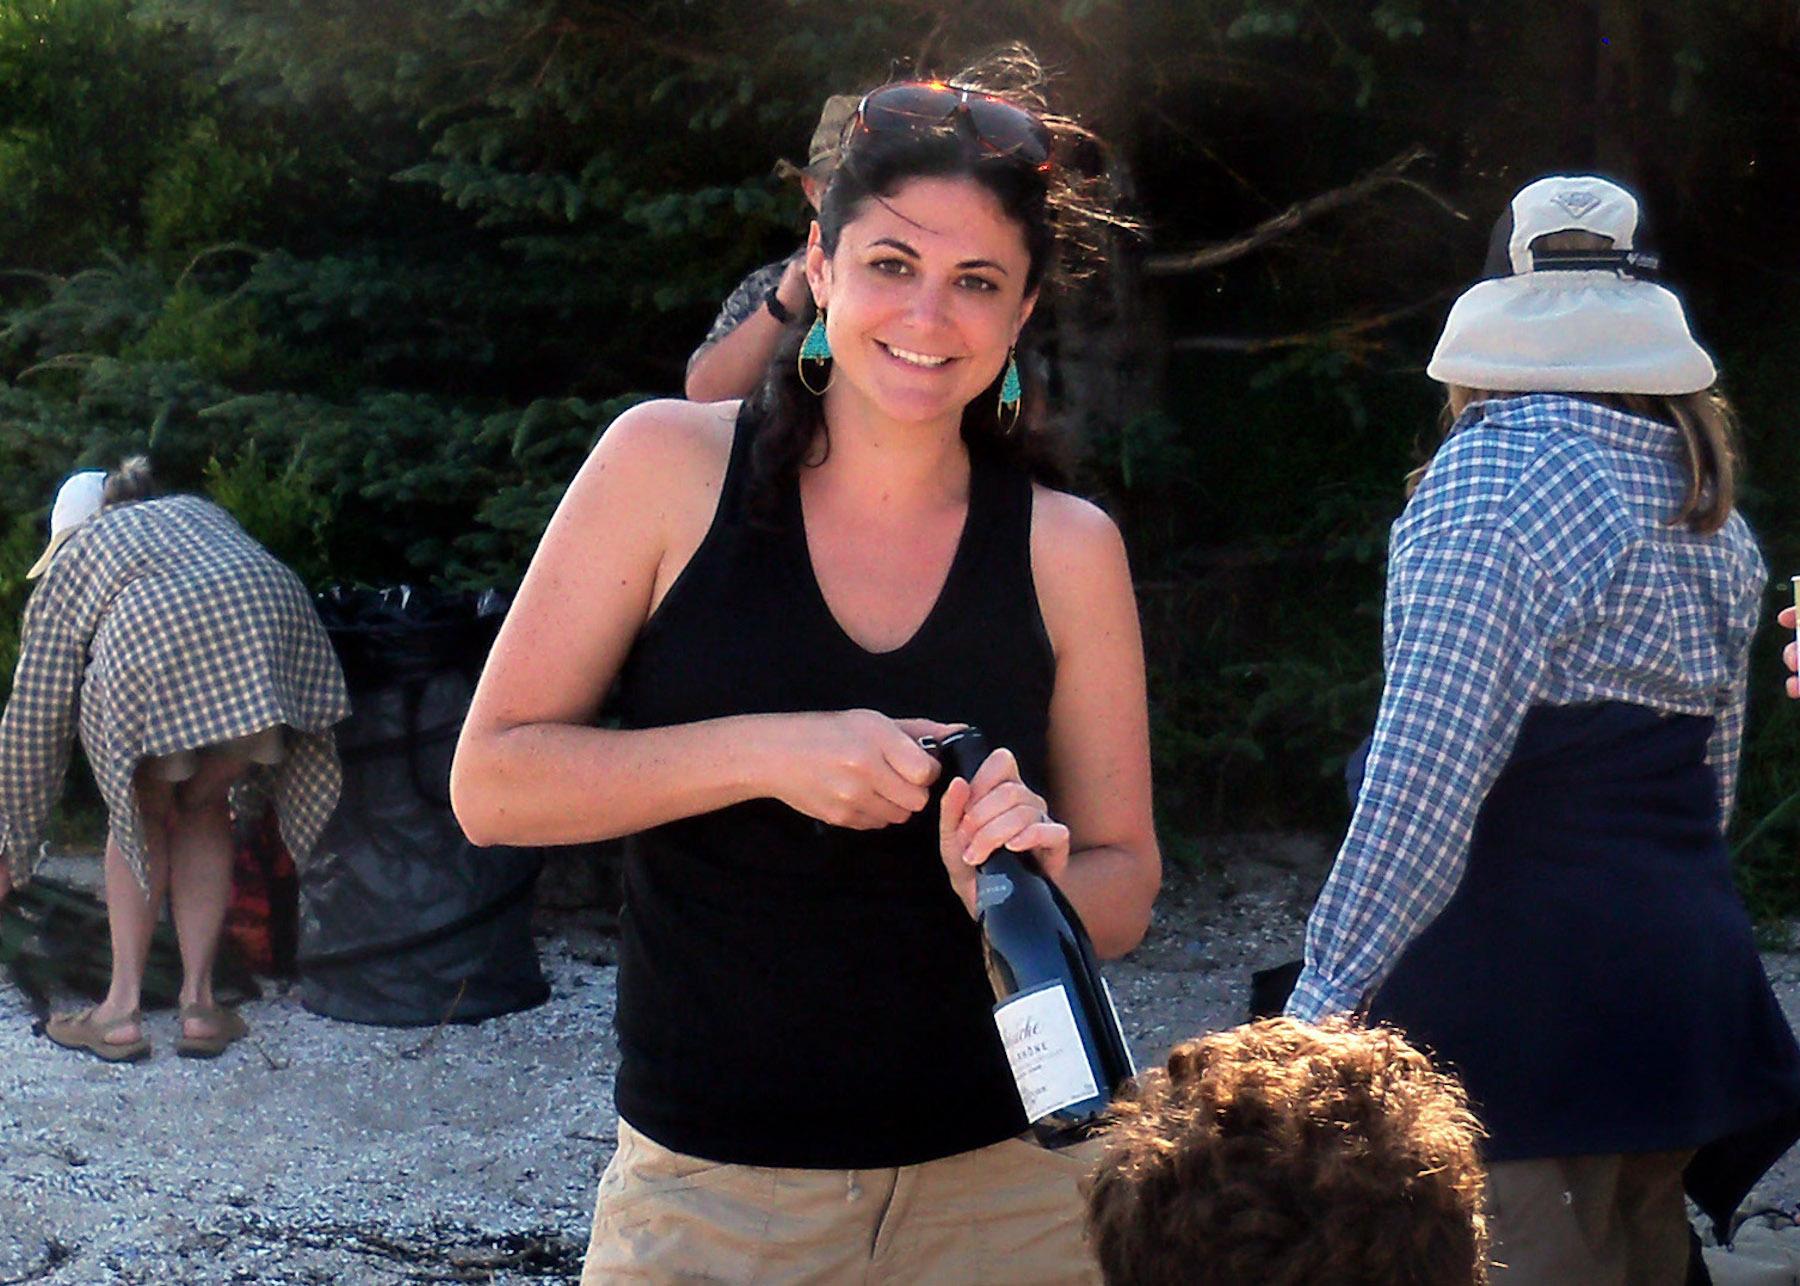 wine-on-beach.jpg